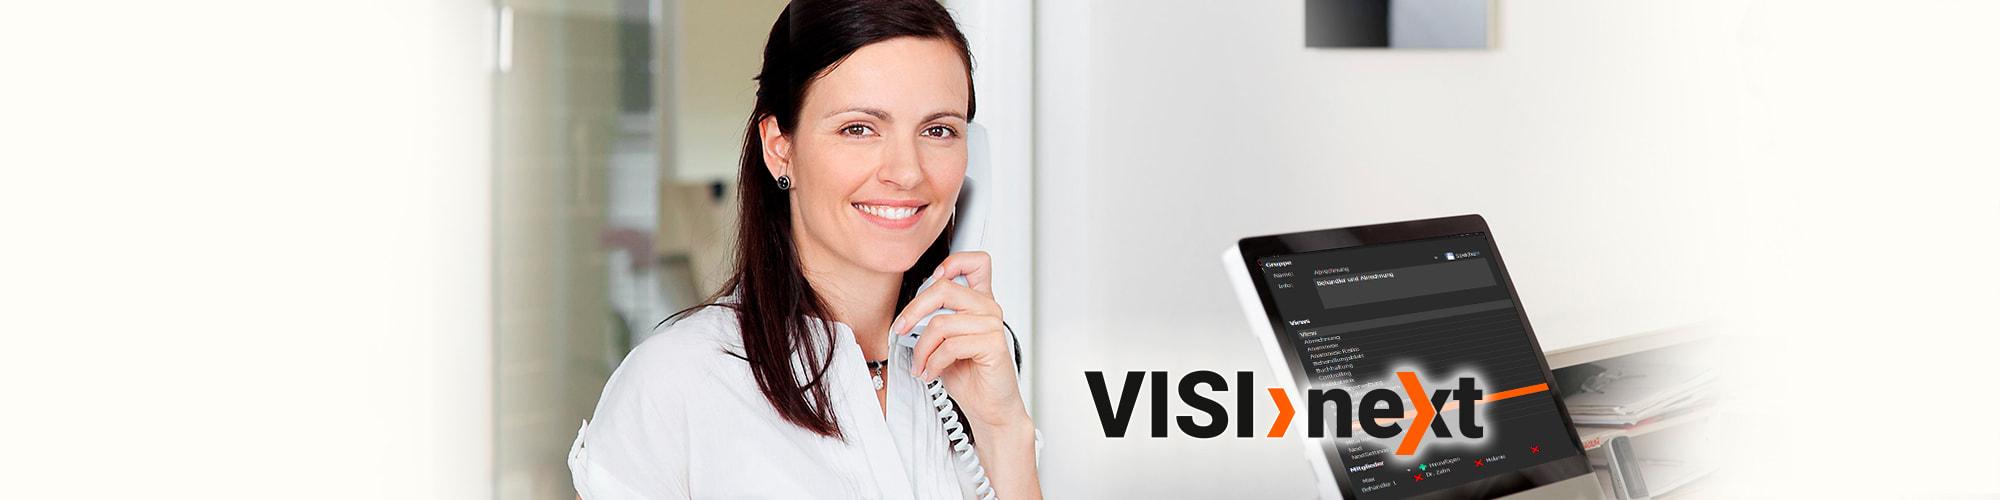 Slider Praxismanager Rechteverwaltung - VISInext BDV GmbH